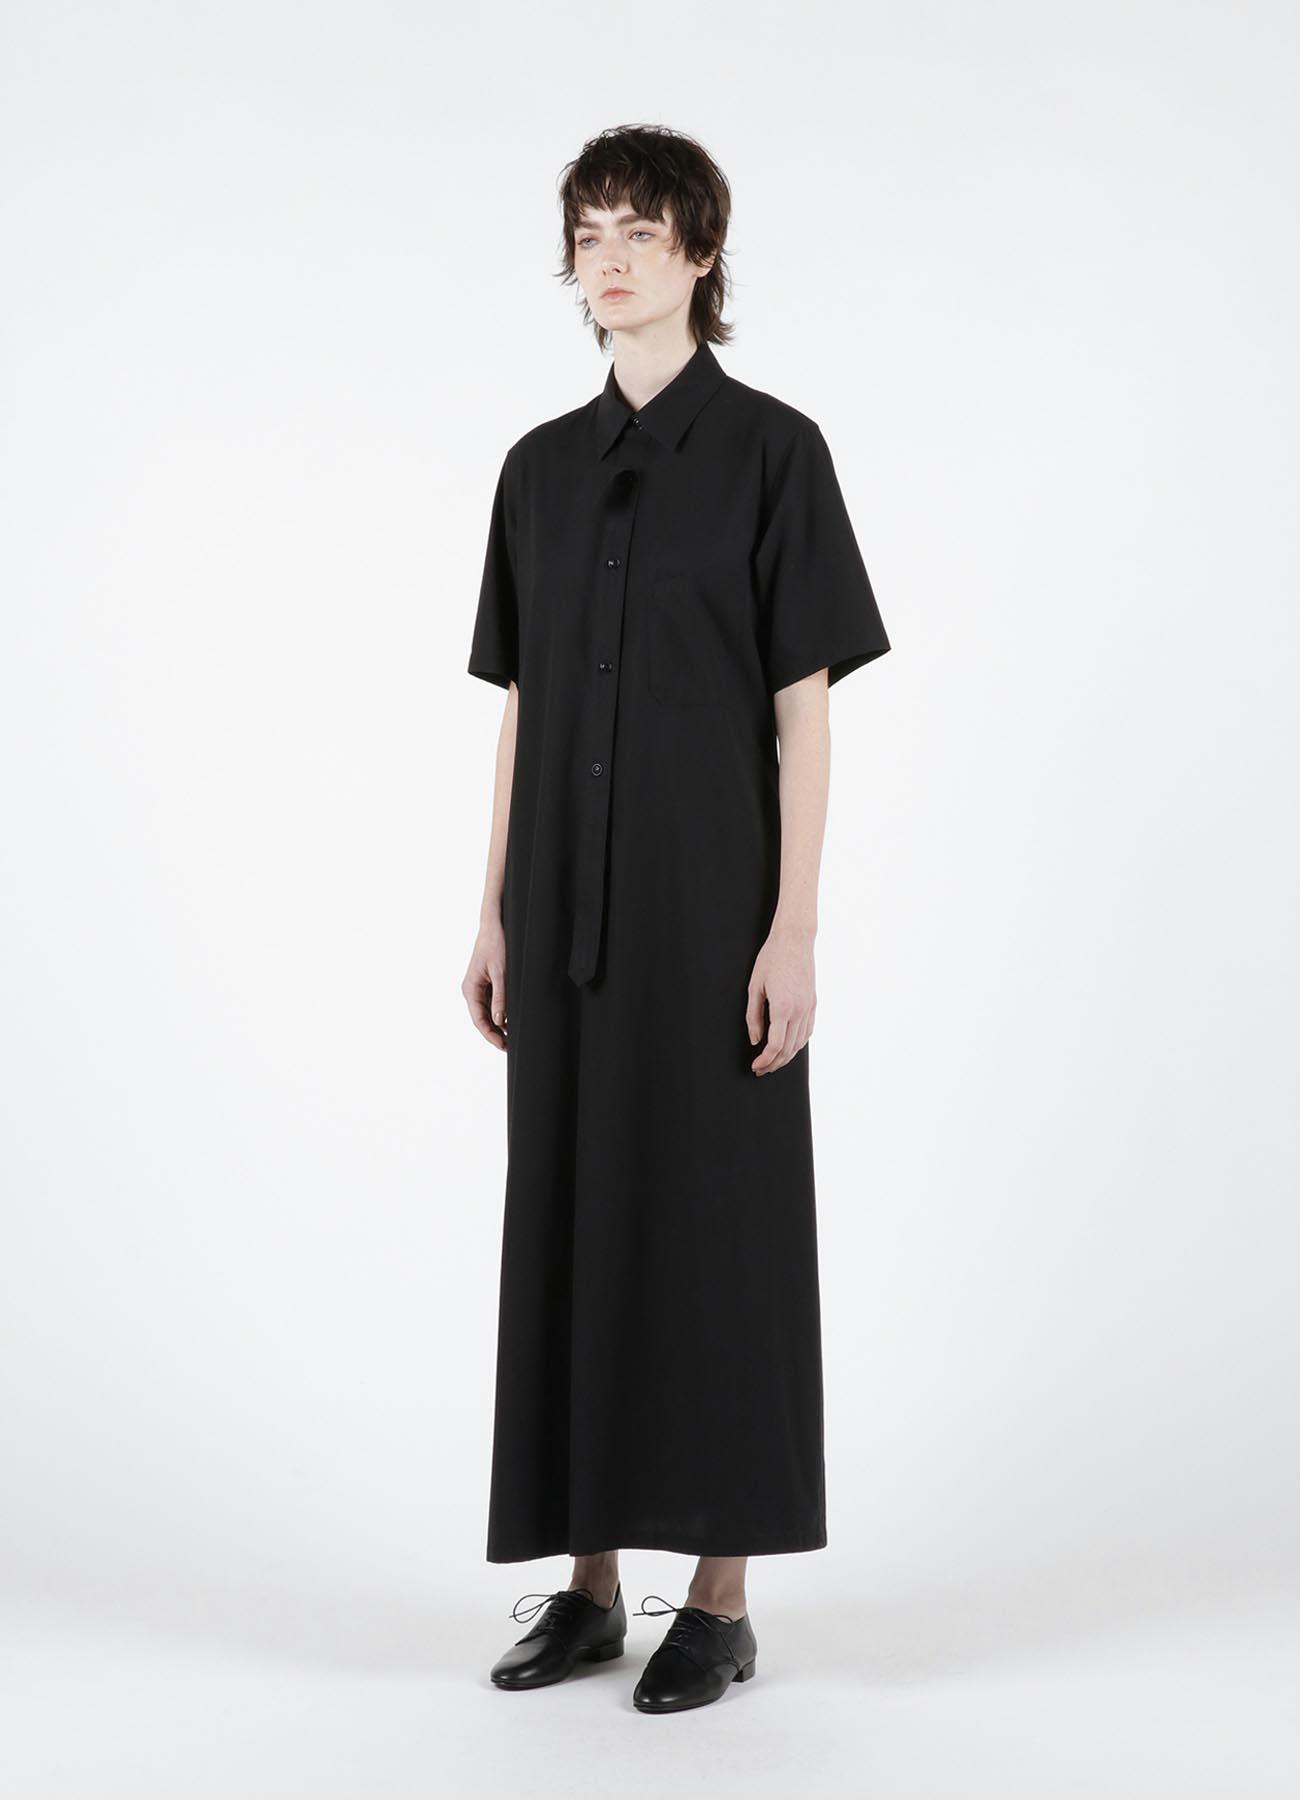 60/2 TWISTED GABARDINE SHORT SLEEVE SHIRT DRESS